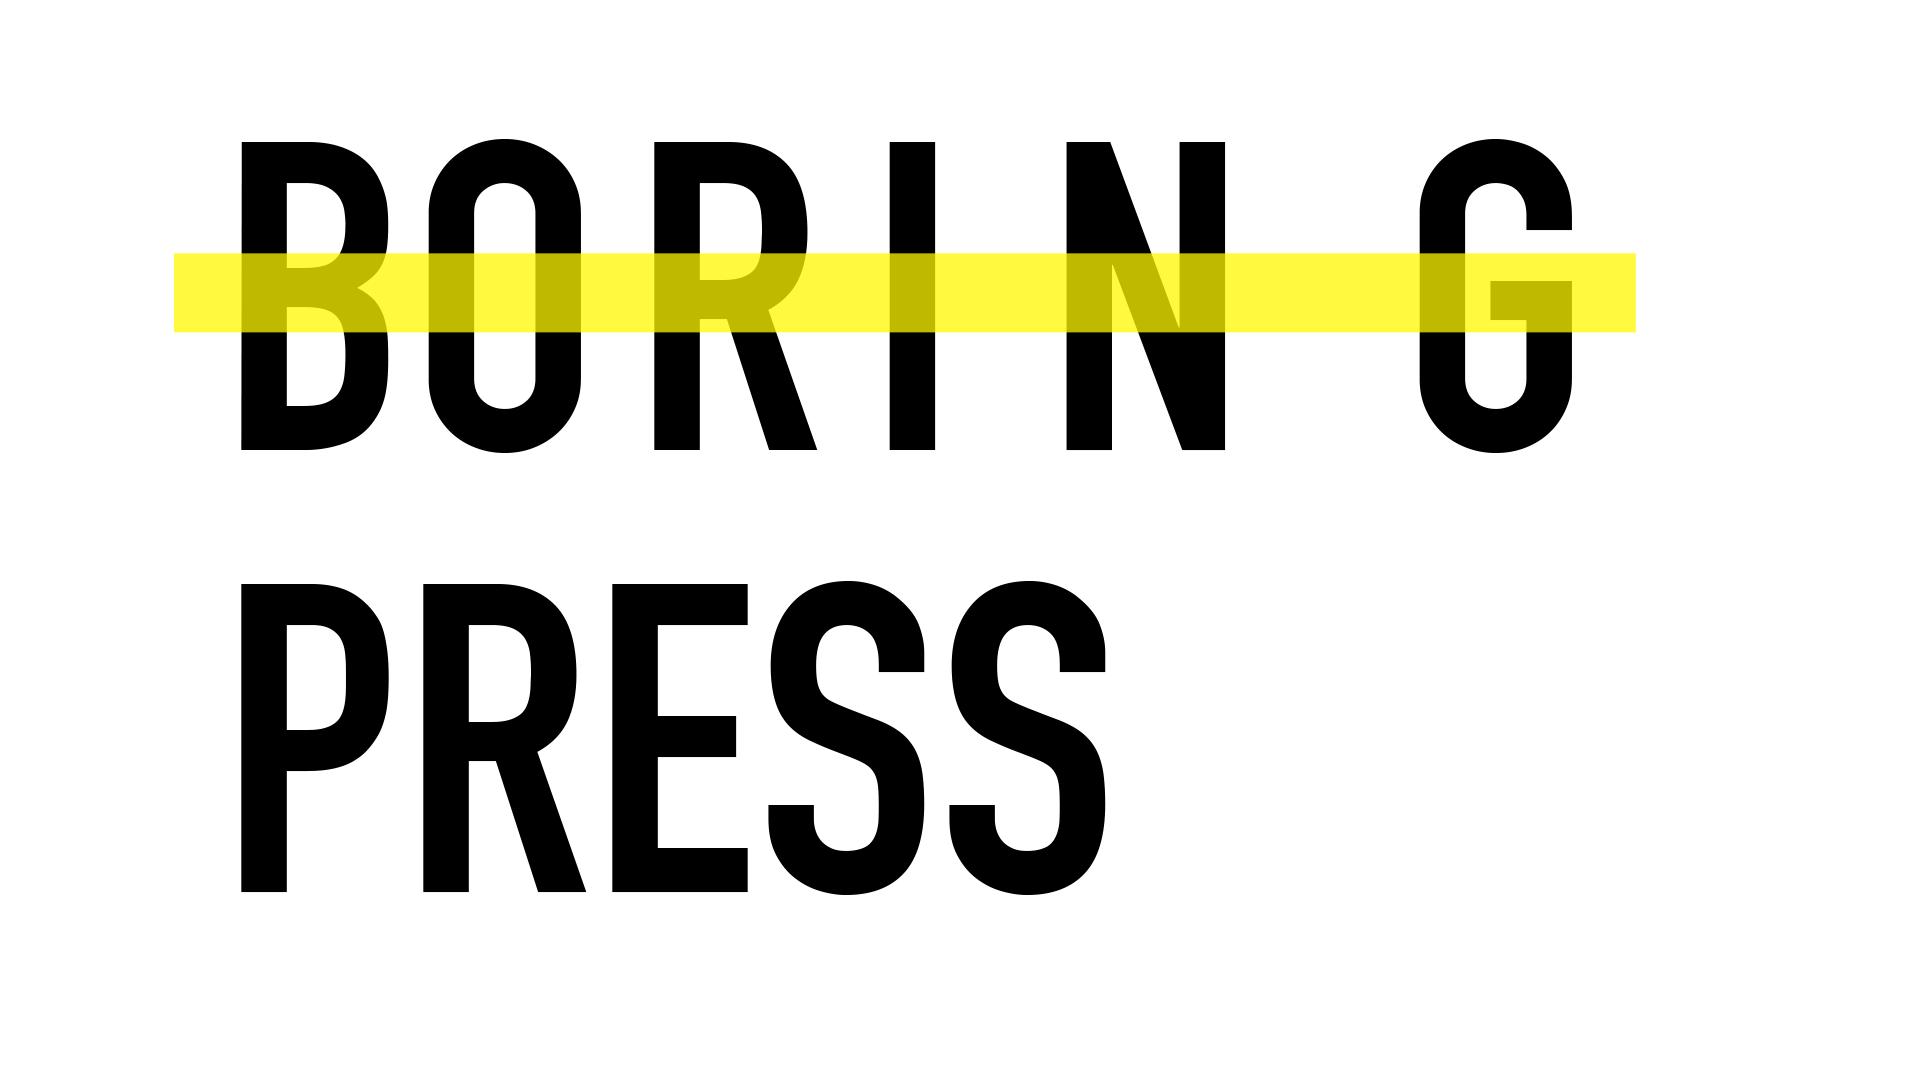 boring press